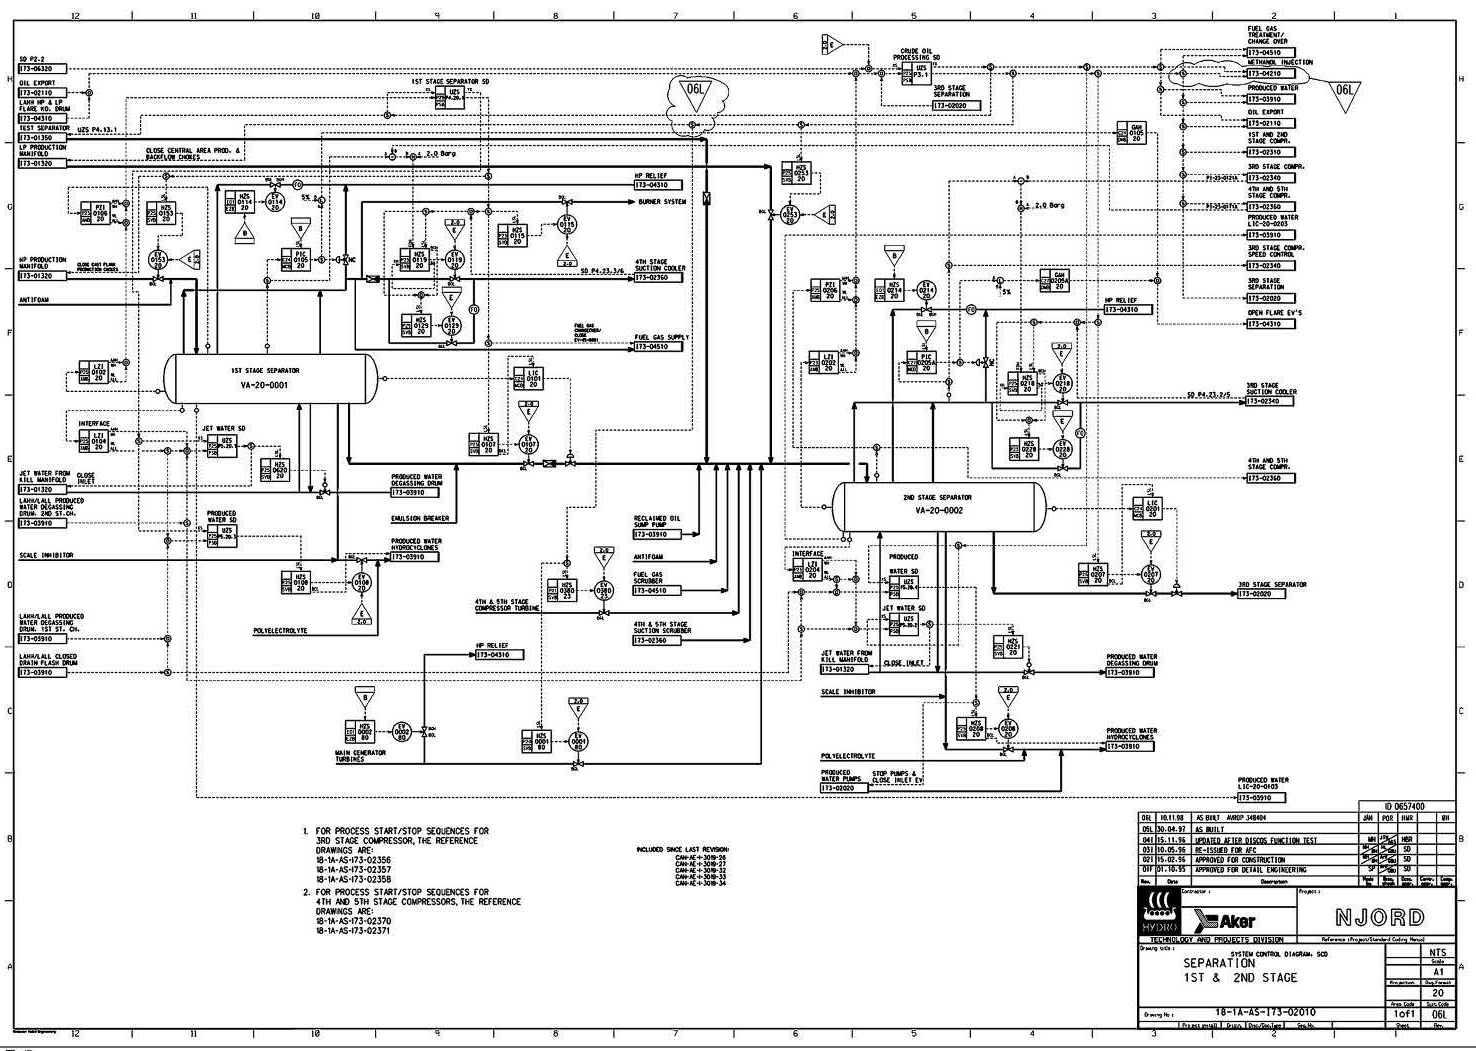 loop wiring diagram yamaha blaster stator oilfield diagrams petroleum